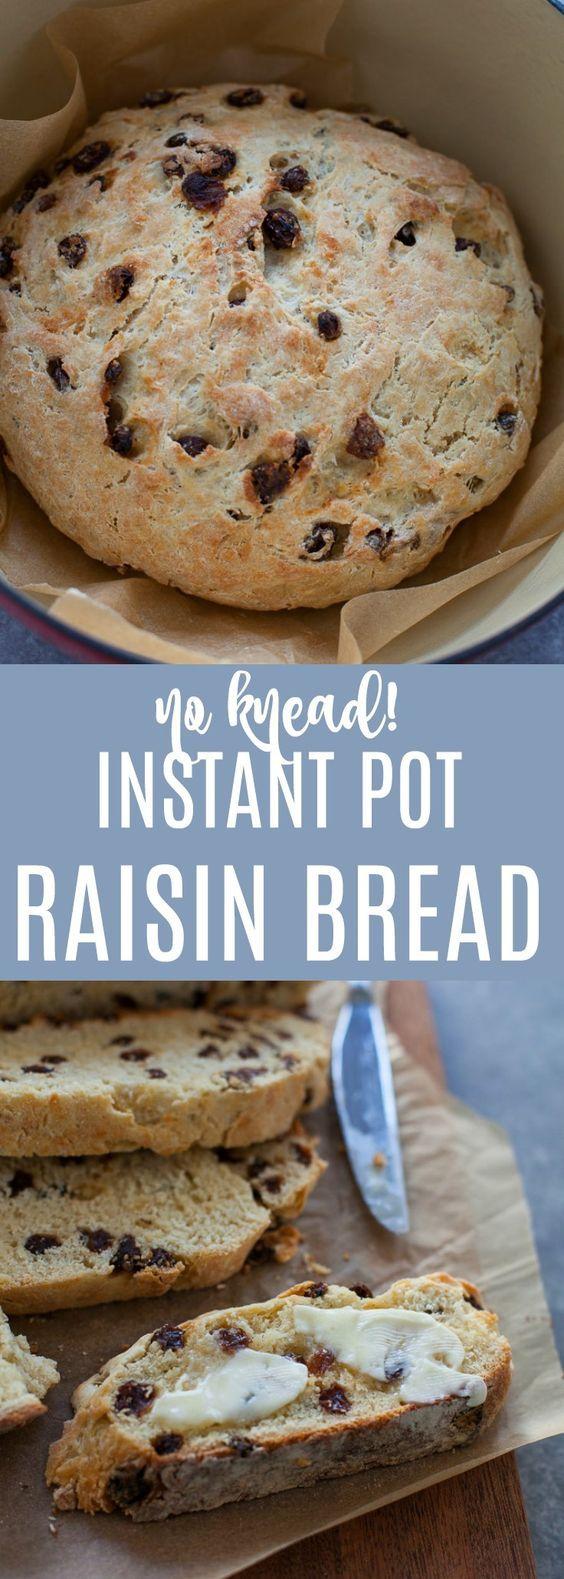 Instant Pot Raisin Bread